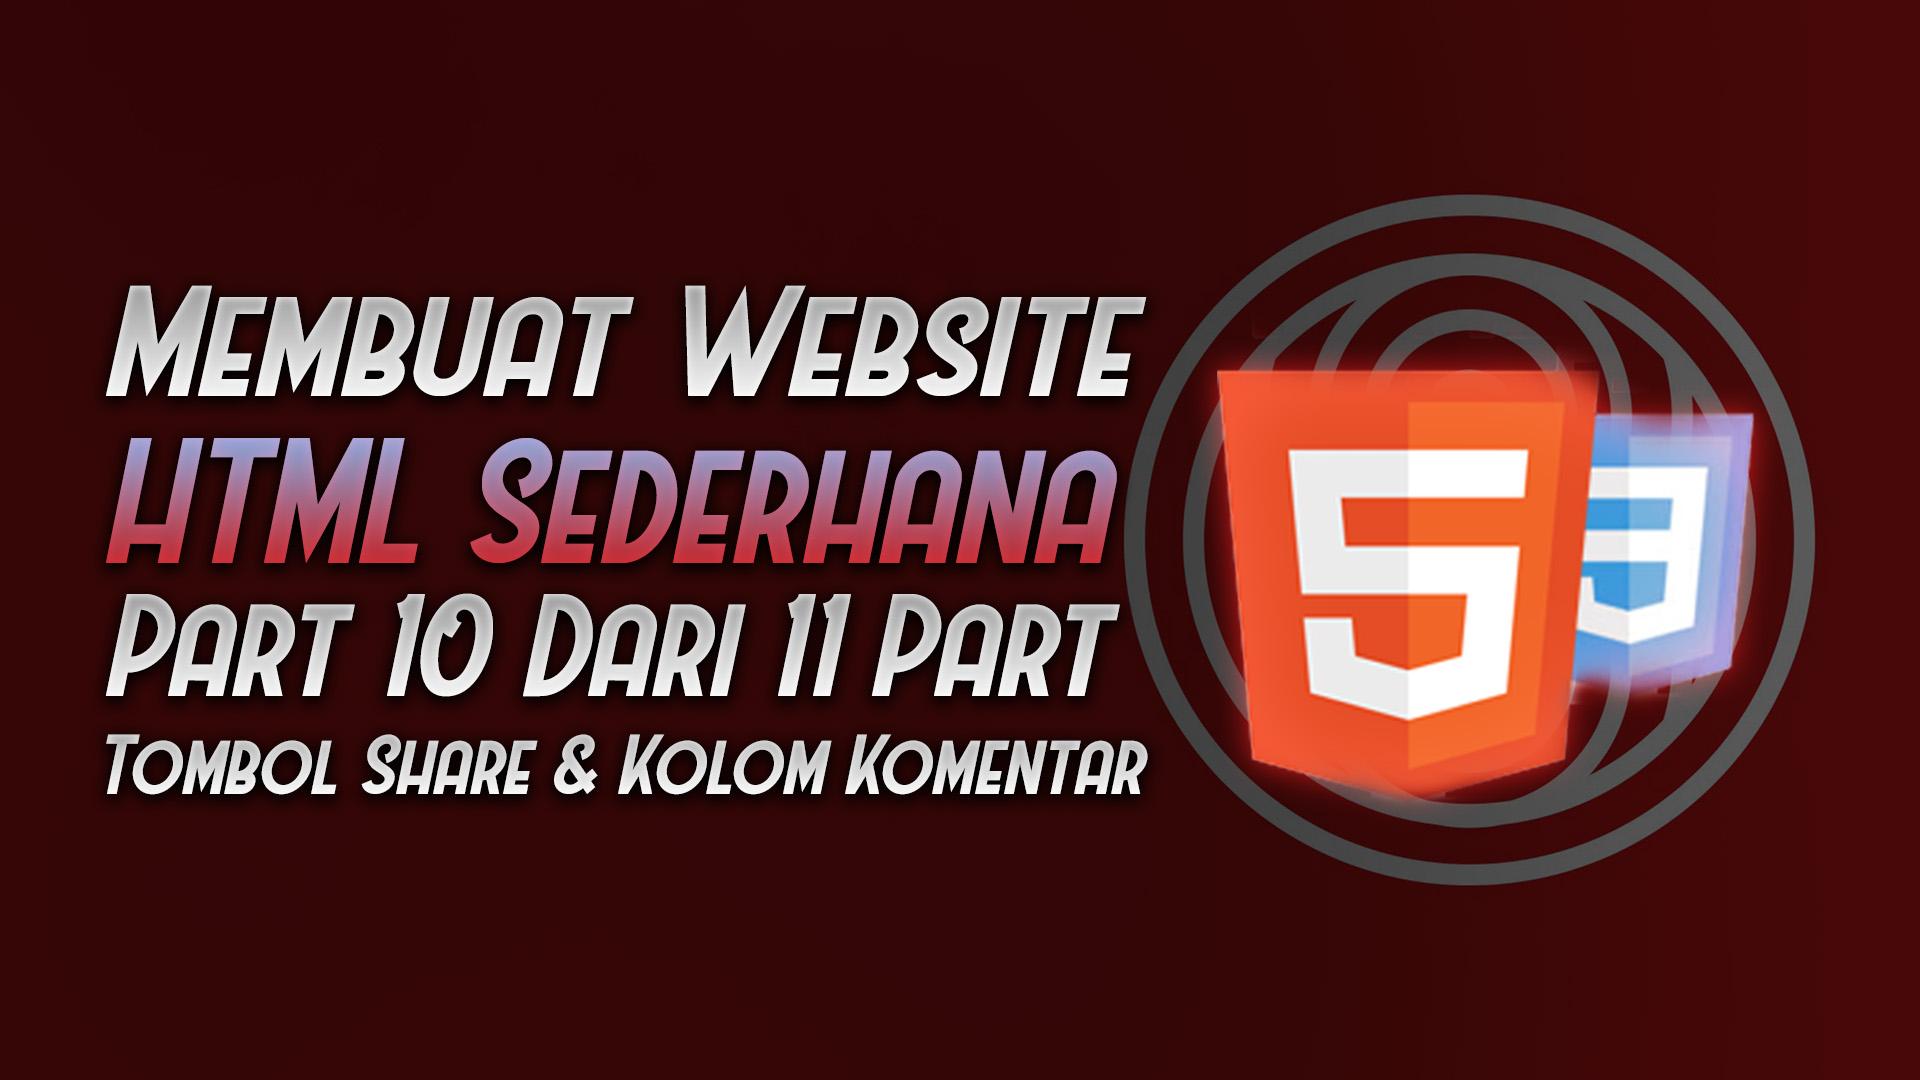 membuat website HTML CSS sederhana part 10 - rio bermano